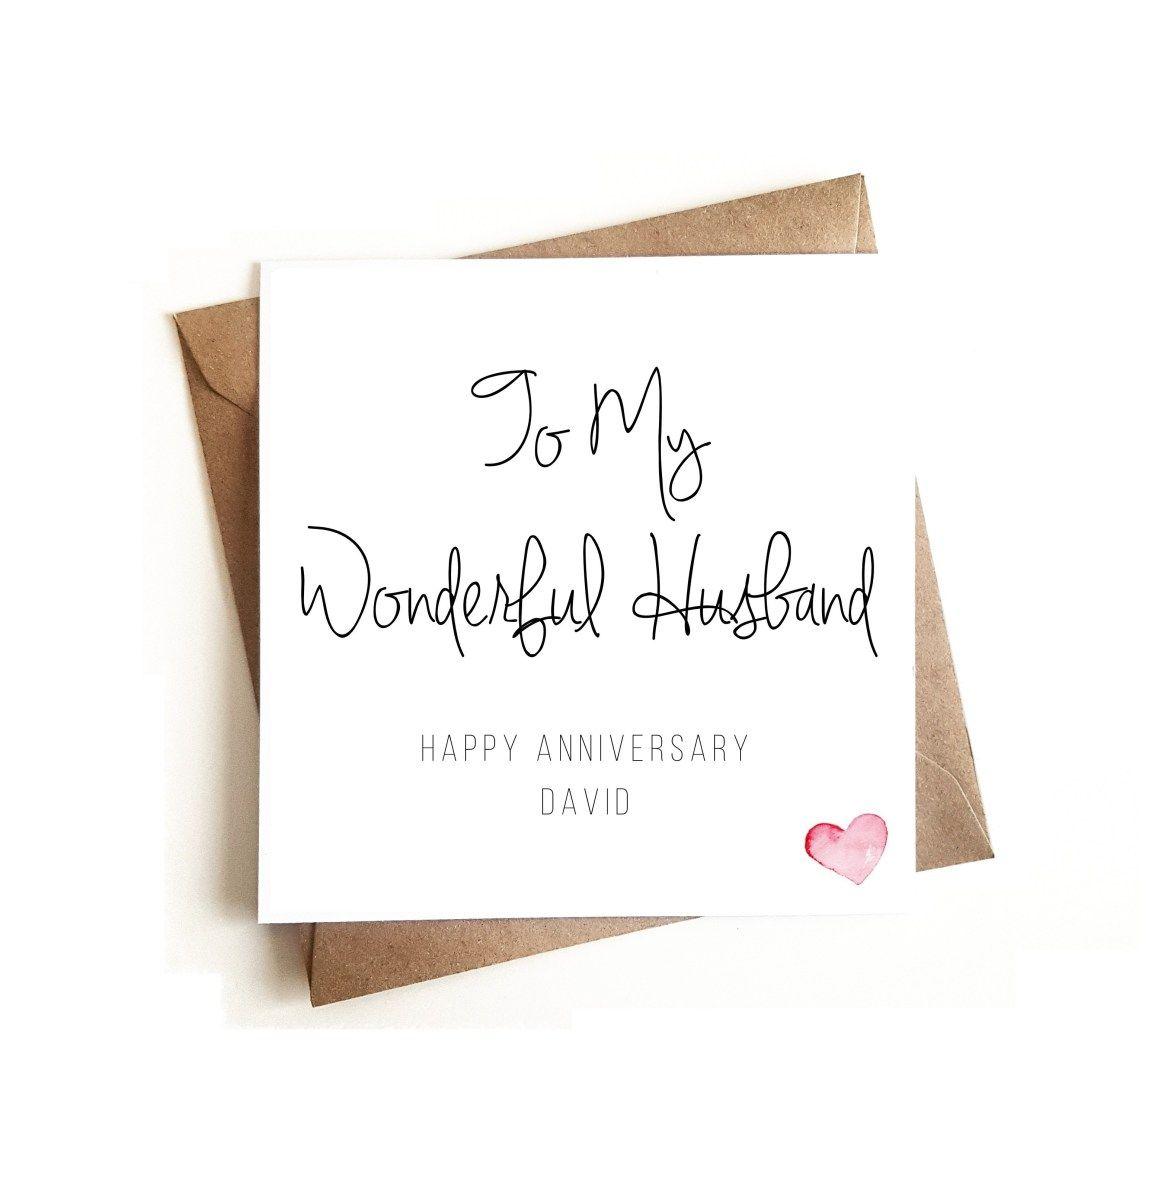 Husband Anniversary Card Ashley Higgins Design Greeting Cards Anniversary Cards For Husband Husband Birthday Card Personalized Anniversary Cards